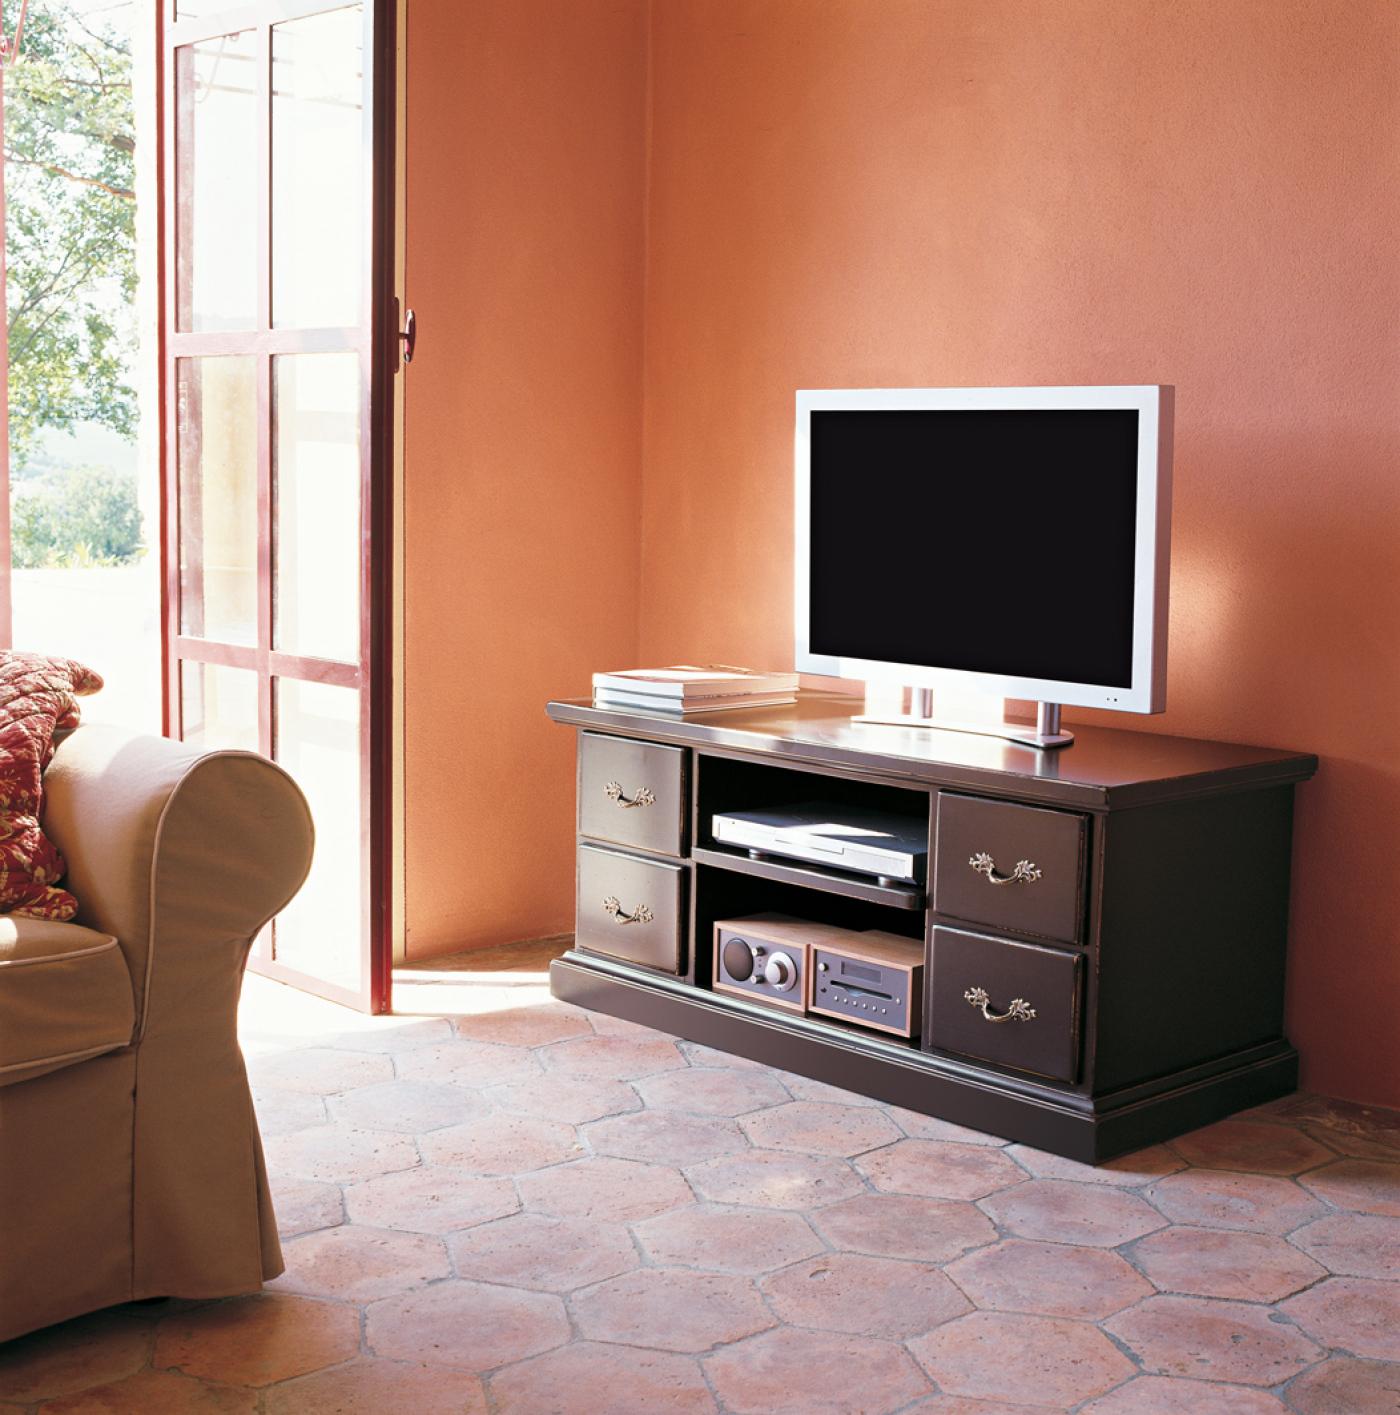 Mobile porta TV Baleari di Tonin Casa